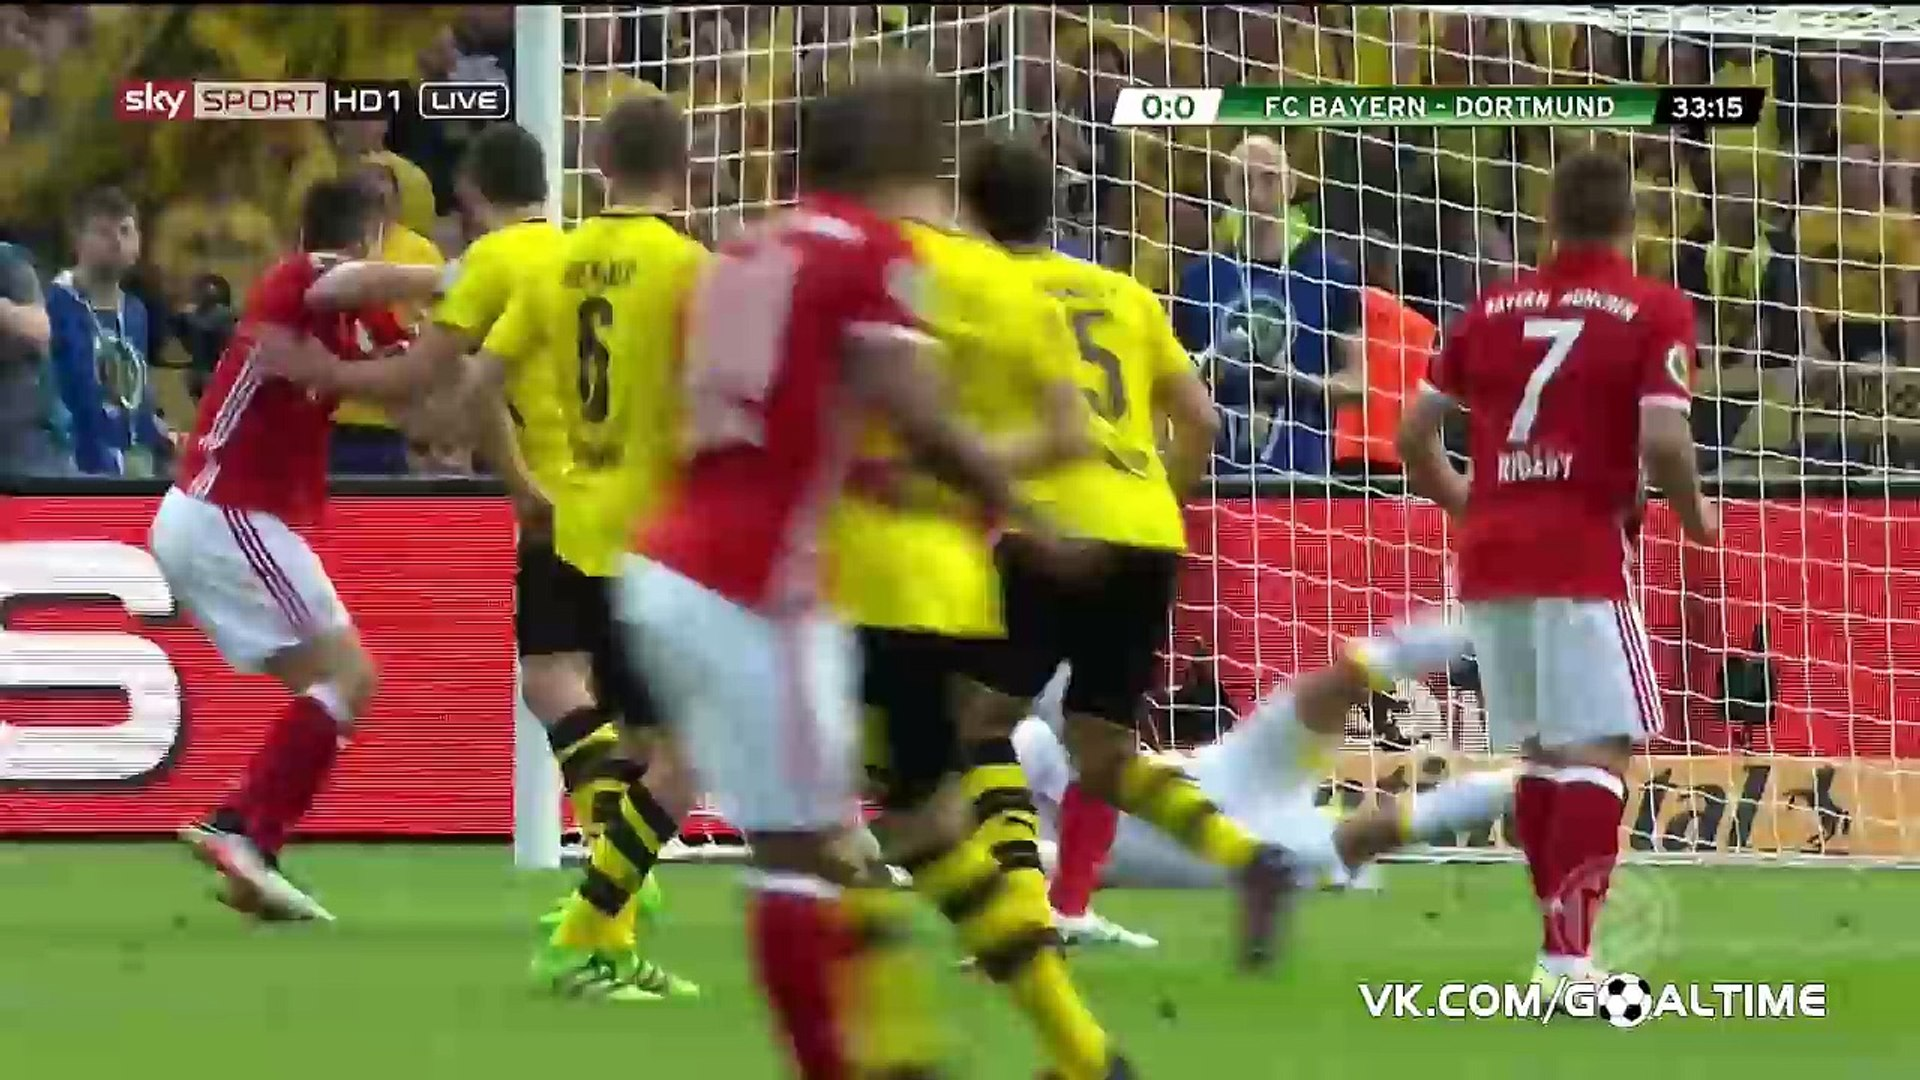 Обзор матча бавария боруссия финал кубка германии